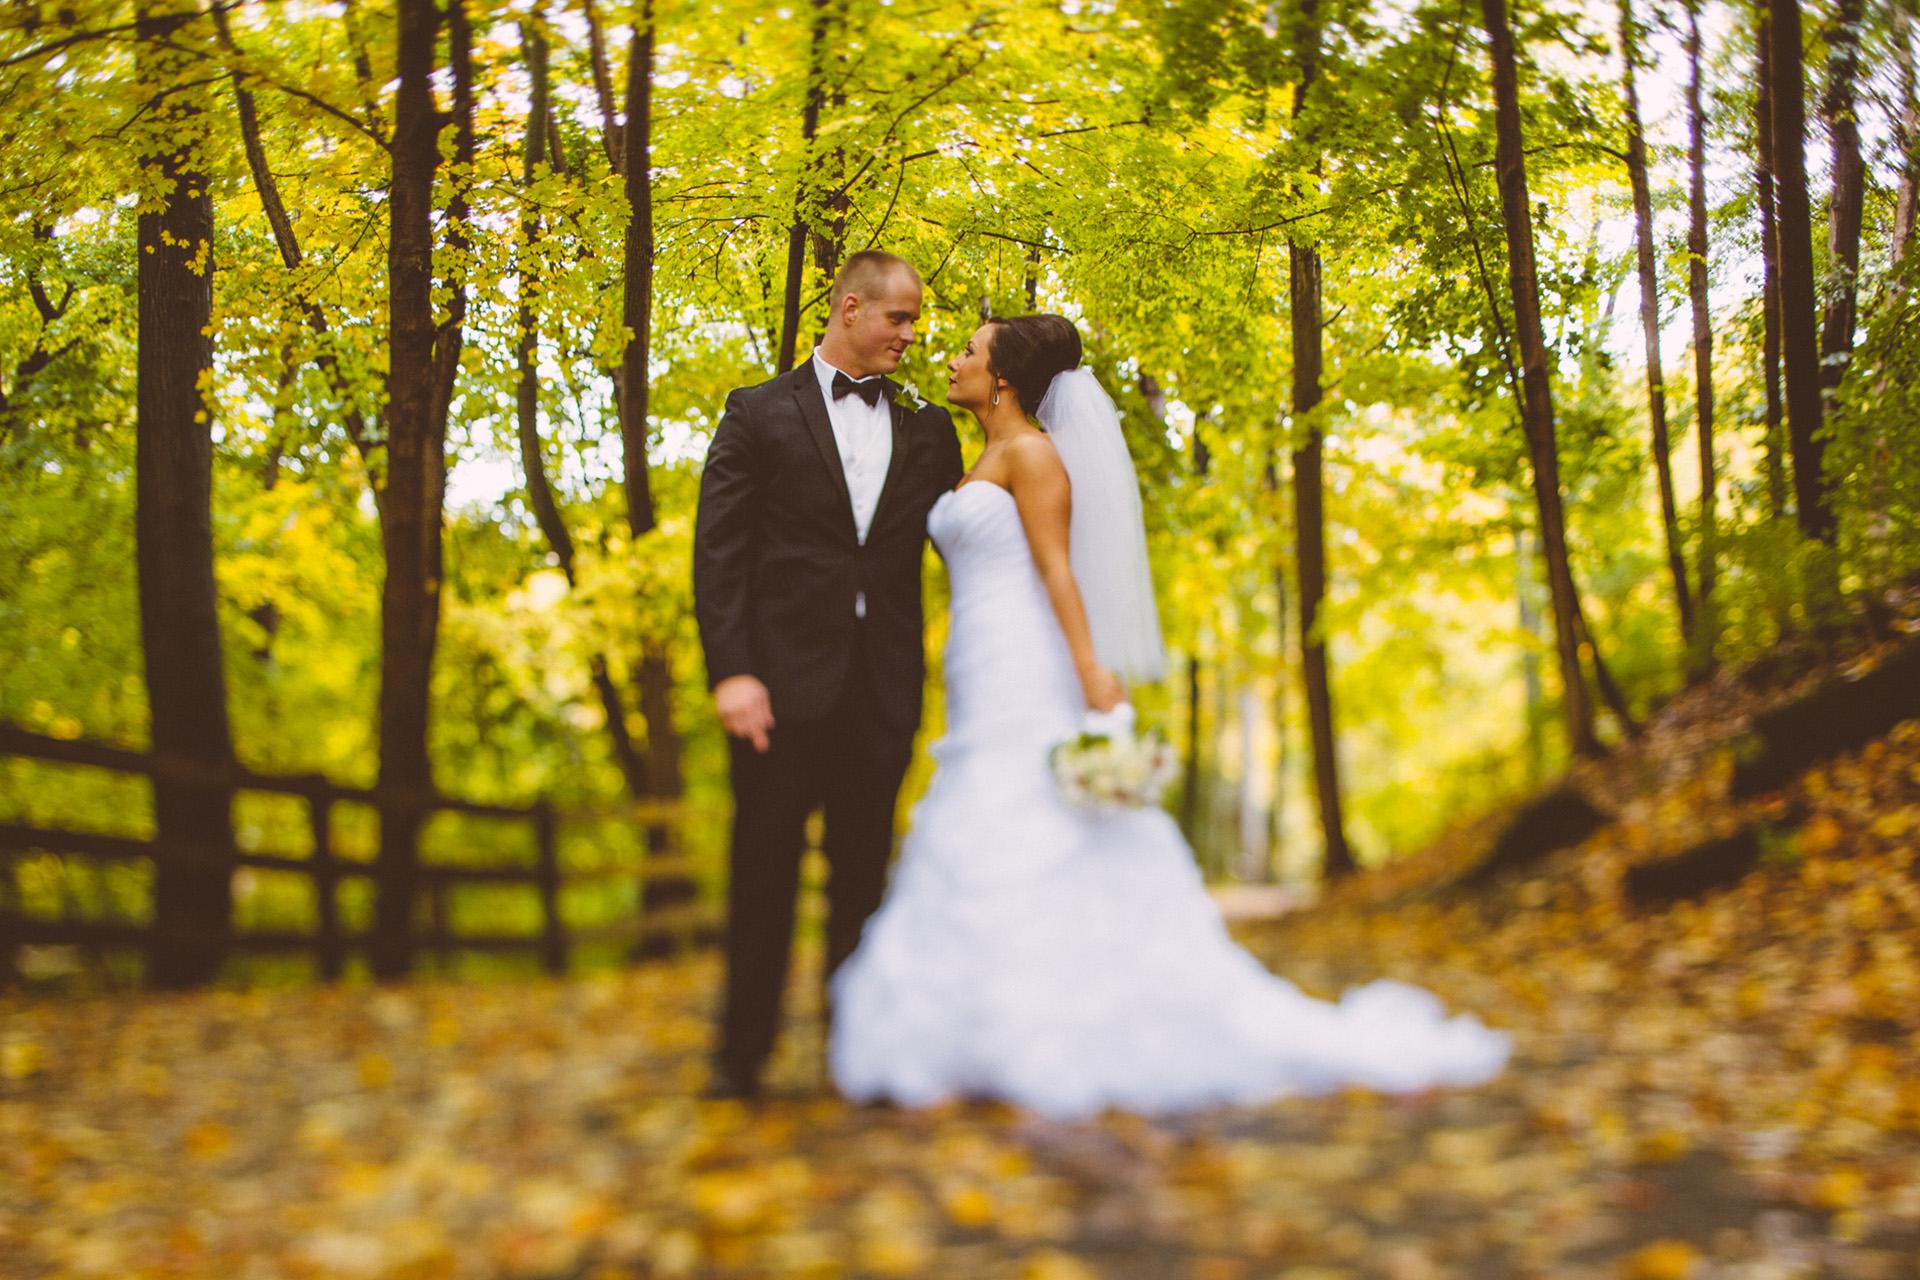 Cleveland Wedding Photographer St Christopher's Church Red Tail Golf Club 01.jpg